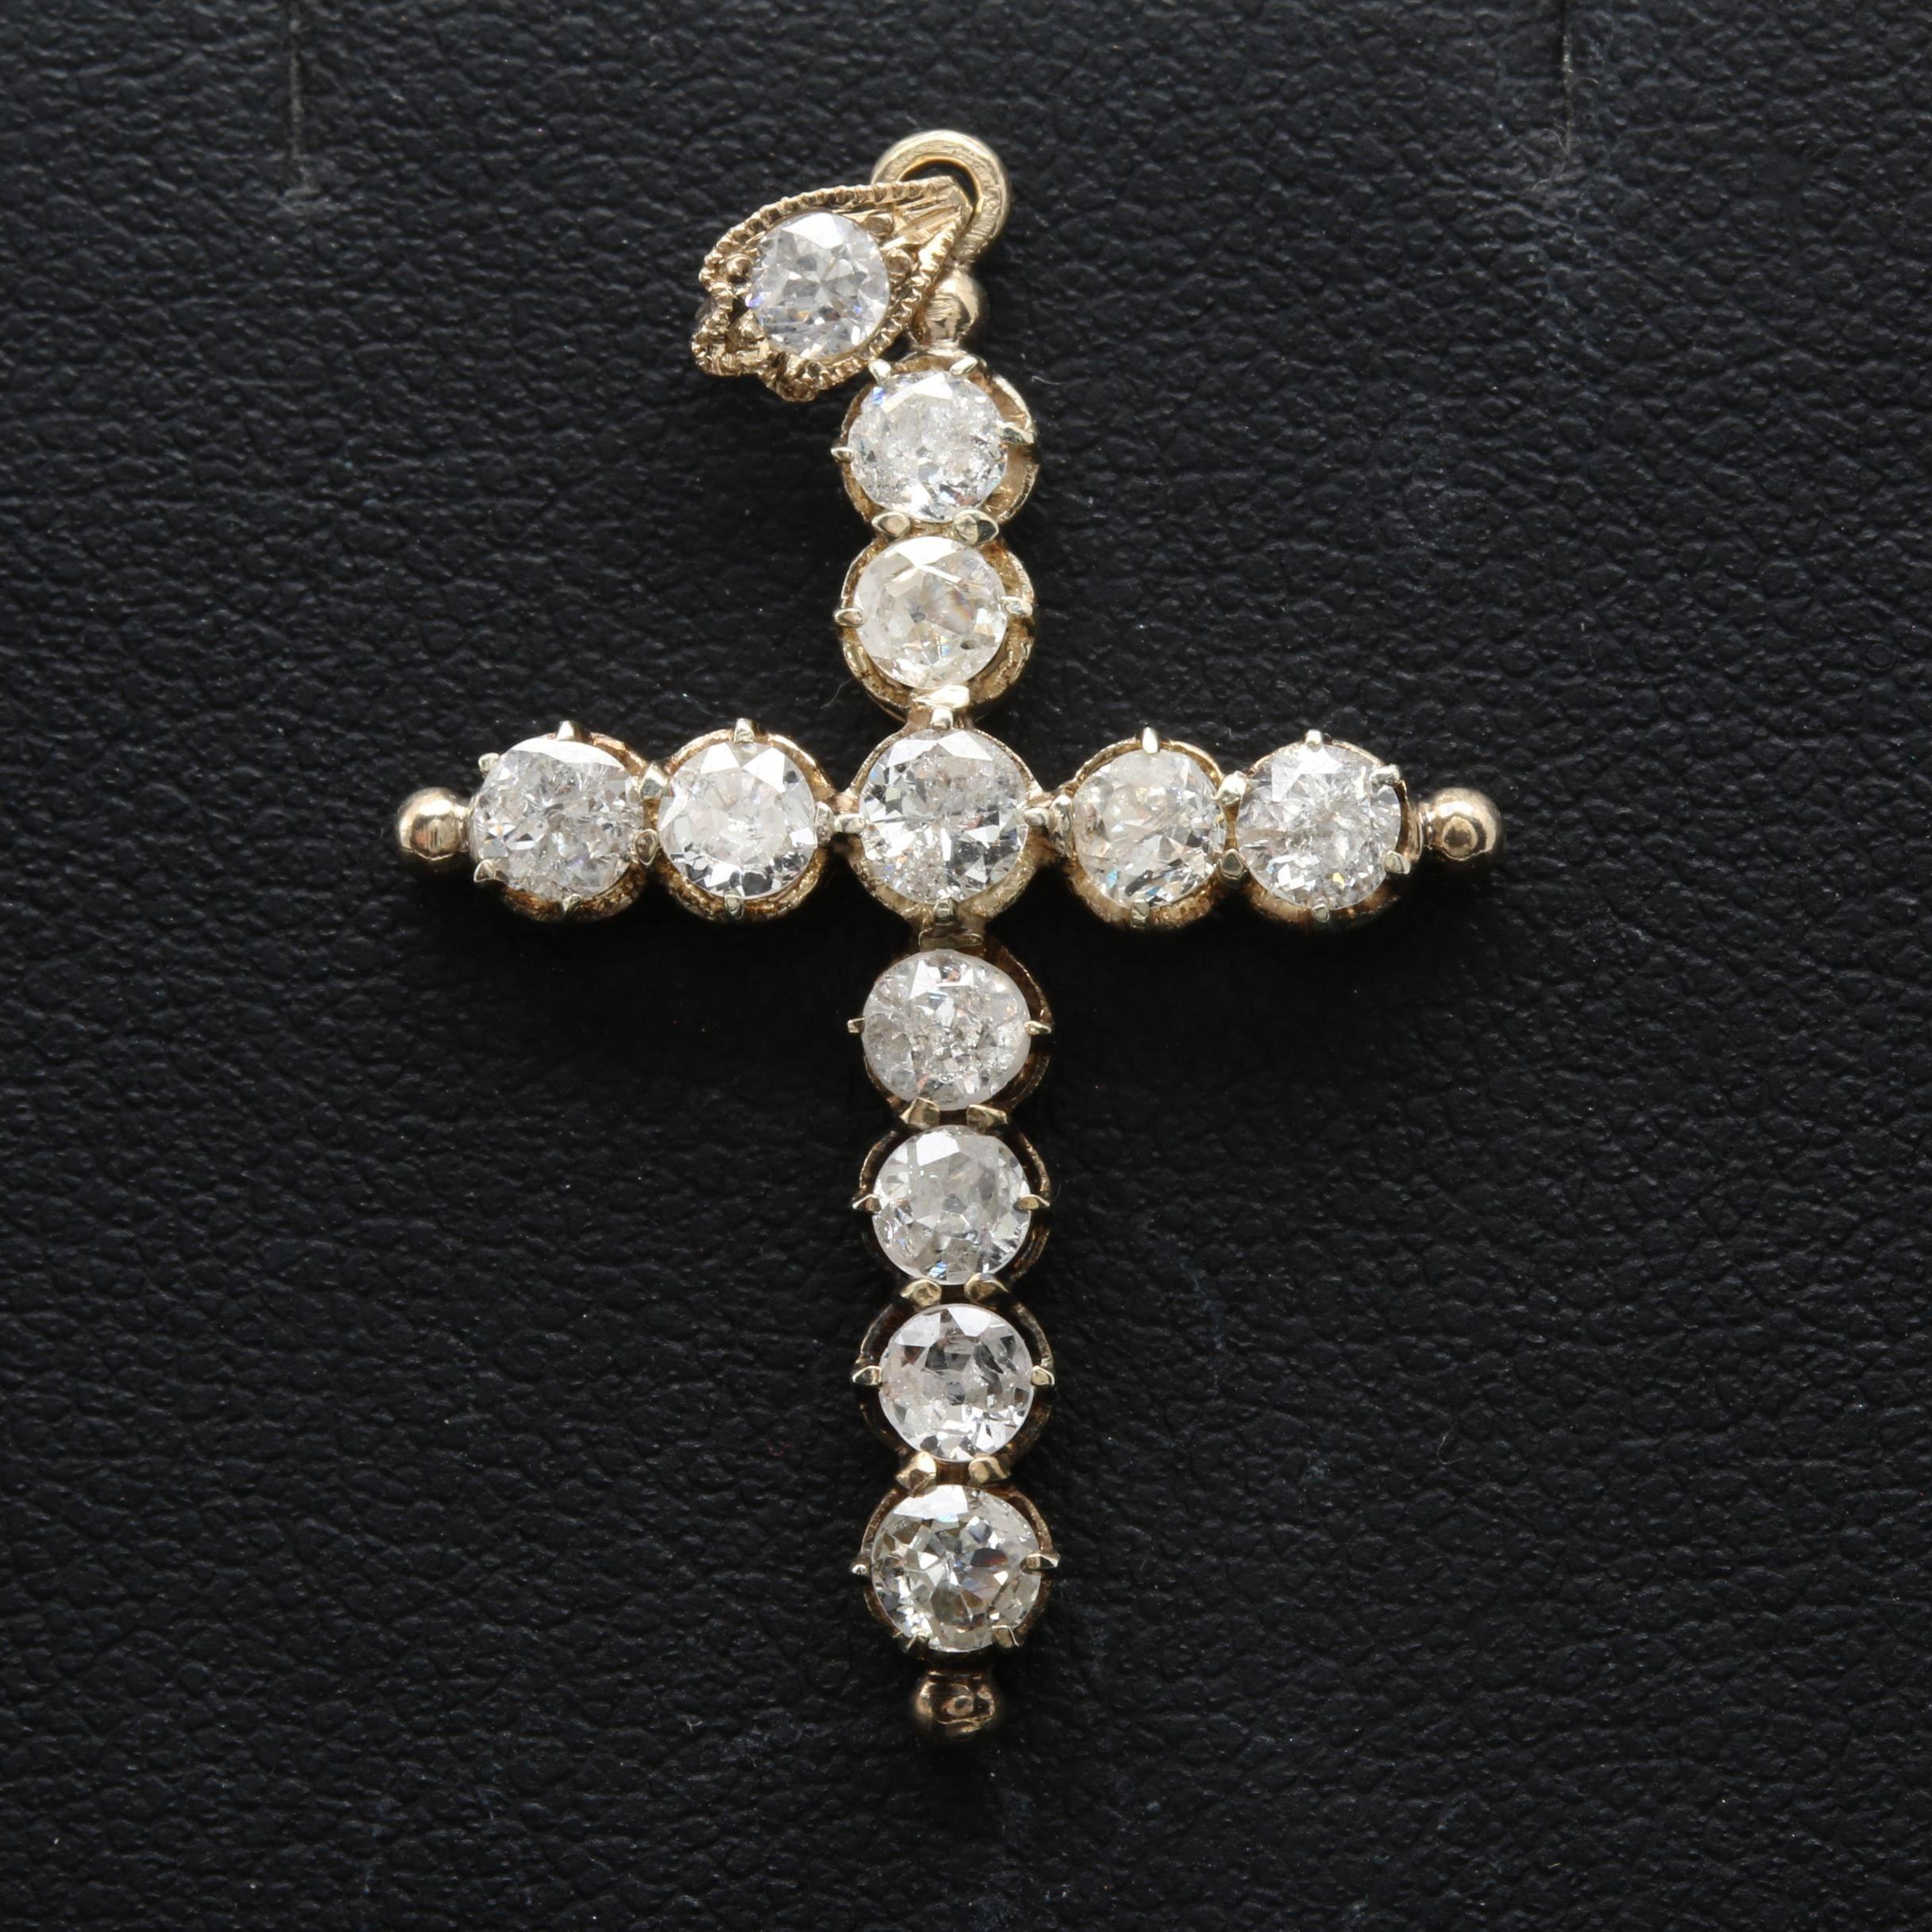 Antique 10K Yellow Gold 1.32 CTW Diamond Cross Pendant